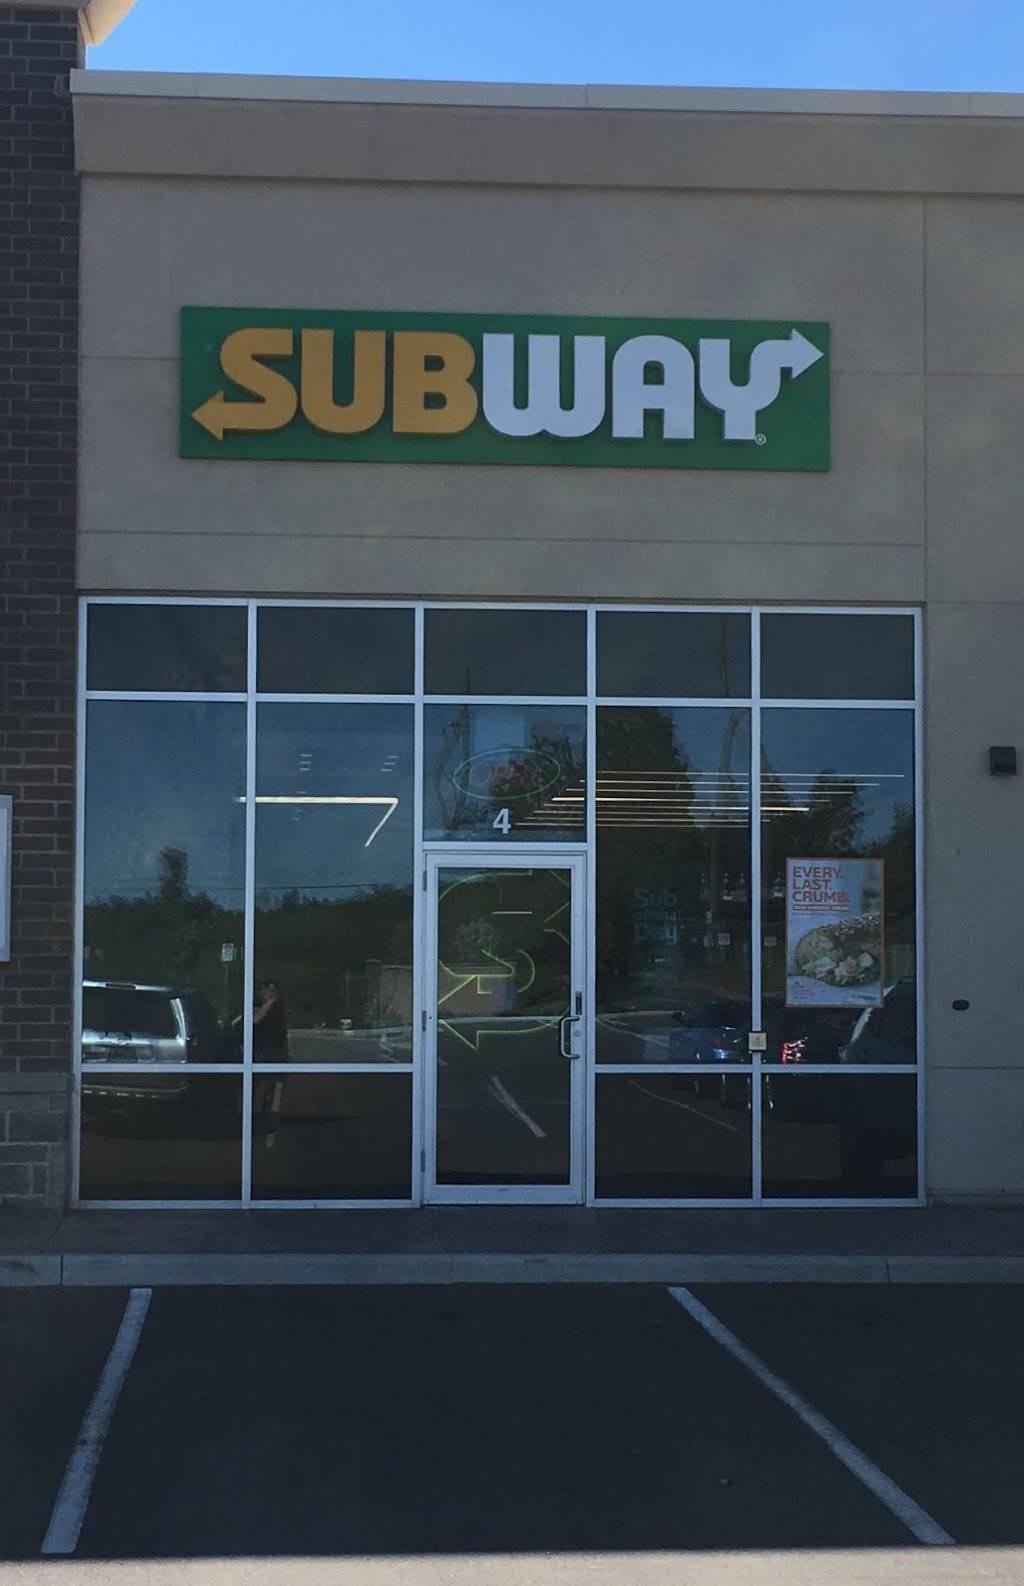 Subway   restaurant   Oakwoods Centre, 1903 Ironoak Way Unit 4, Oakville, ON L6H 0N1, Canada   9058424888 OR +1 905-842-4888